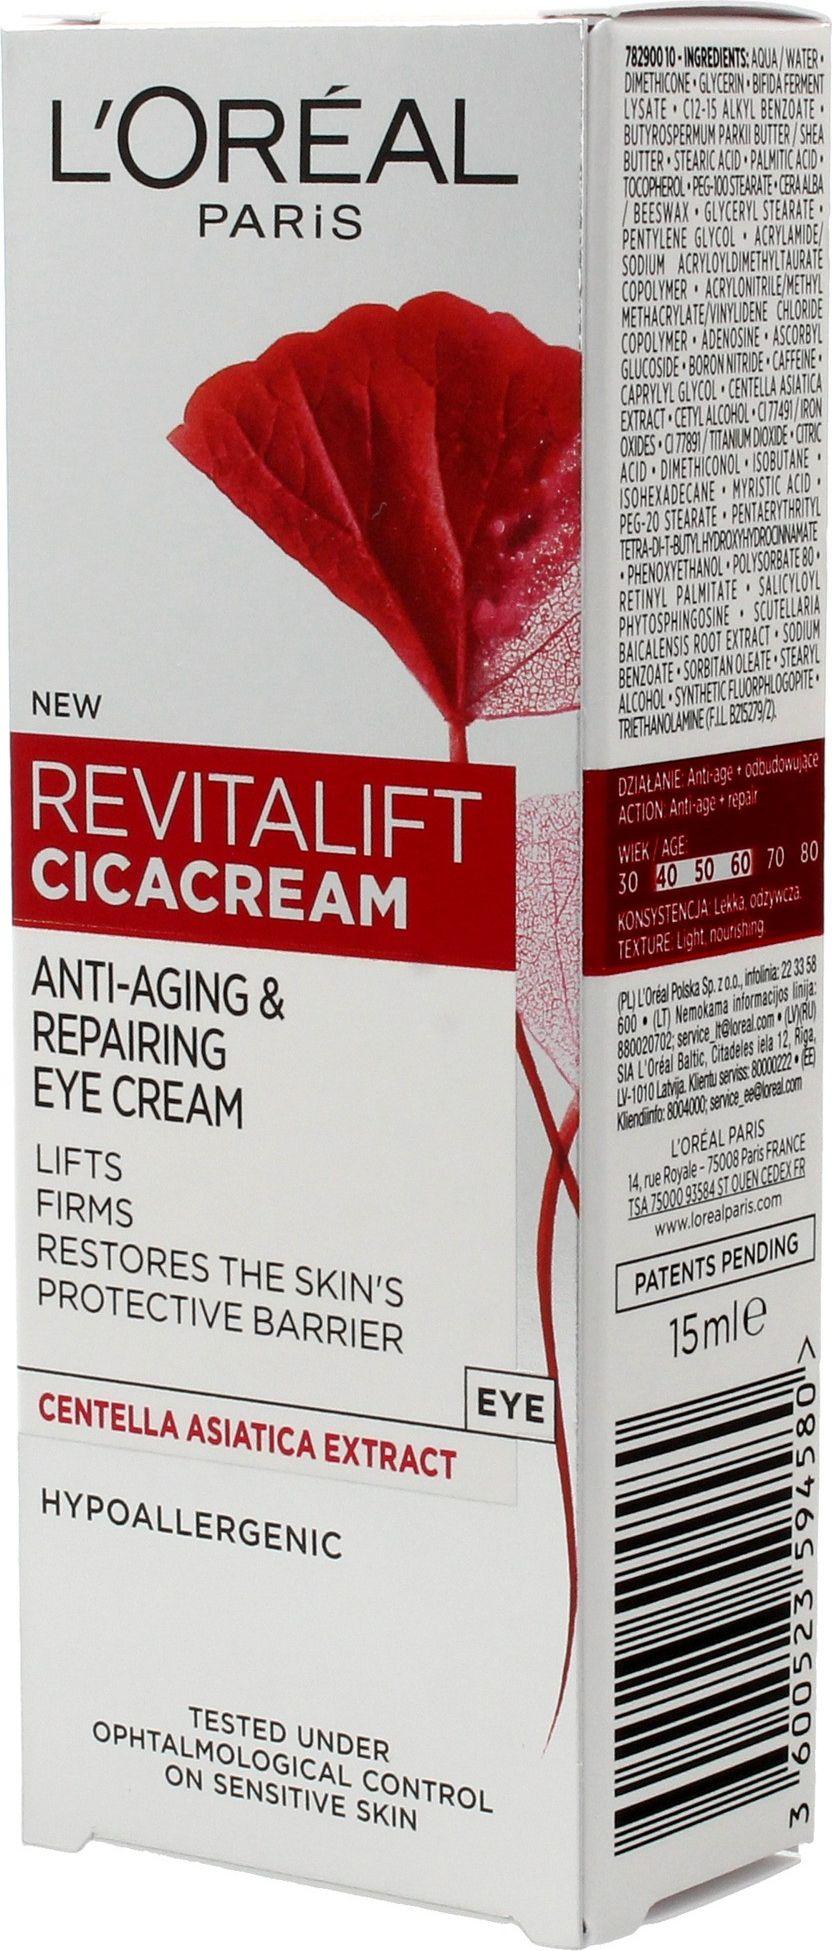 L'Oreal Paris Revitalift Cicacream Anti-Aging & Repairing Eye Cream anti-wrinkle 15ml ēnas